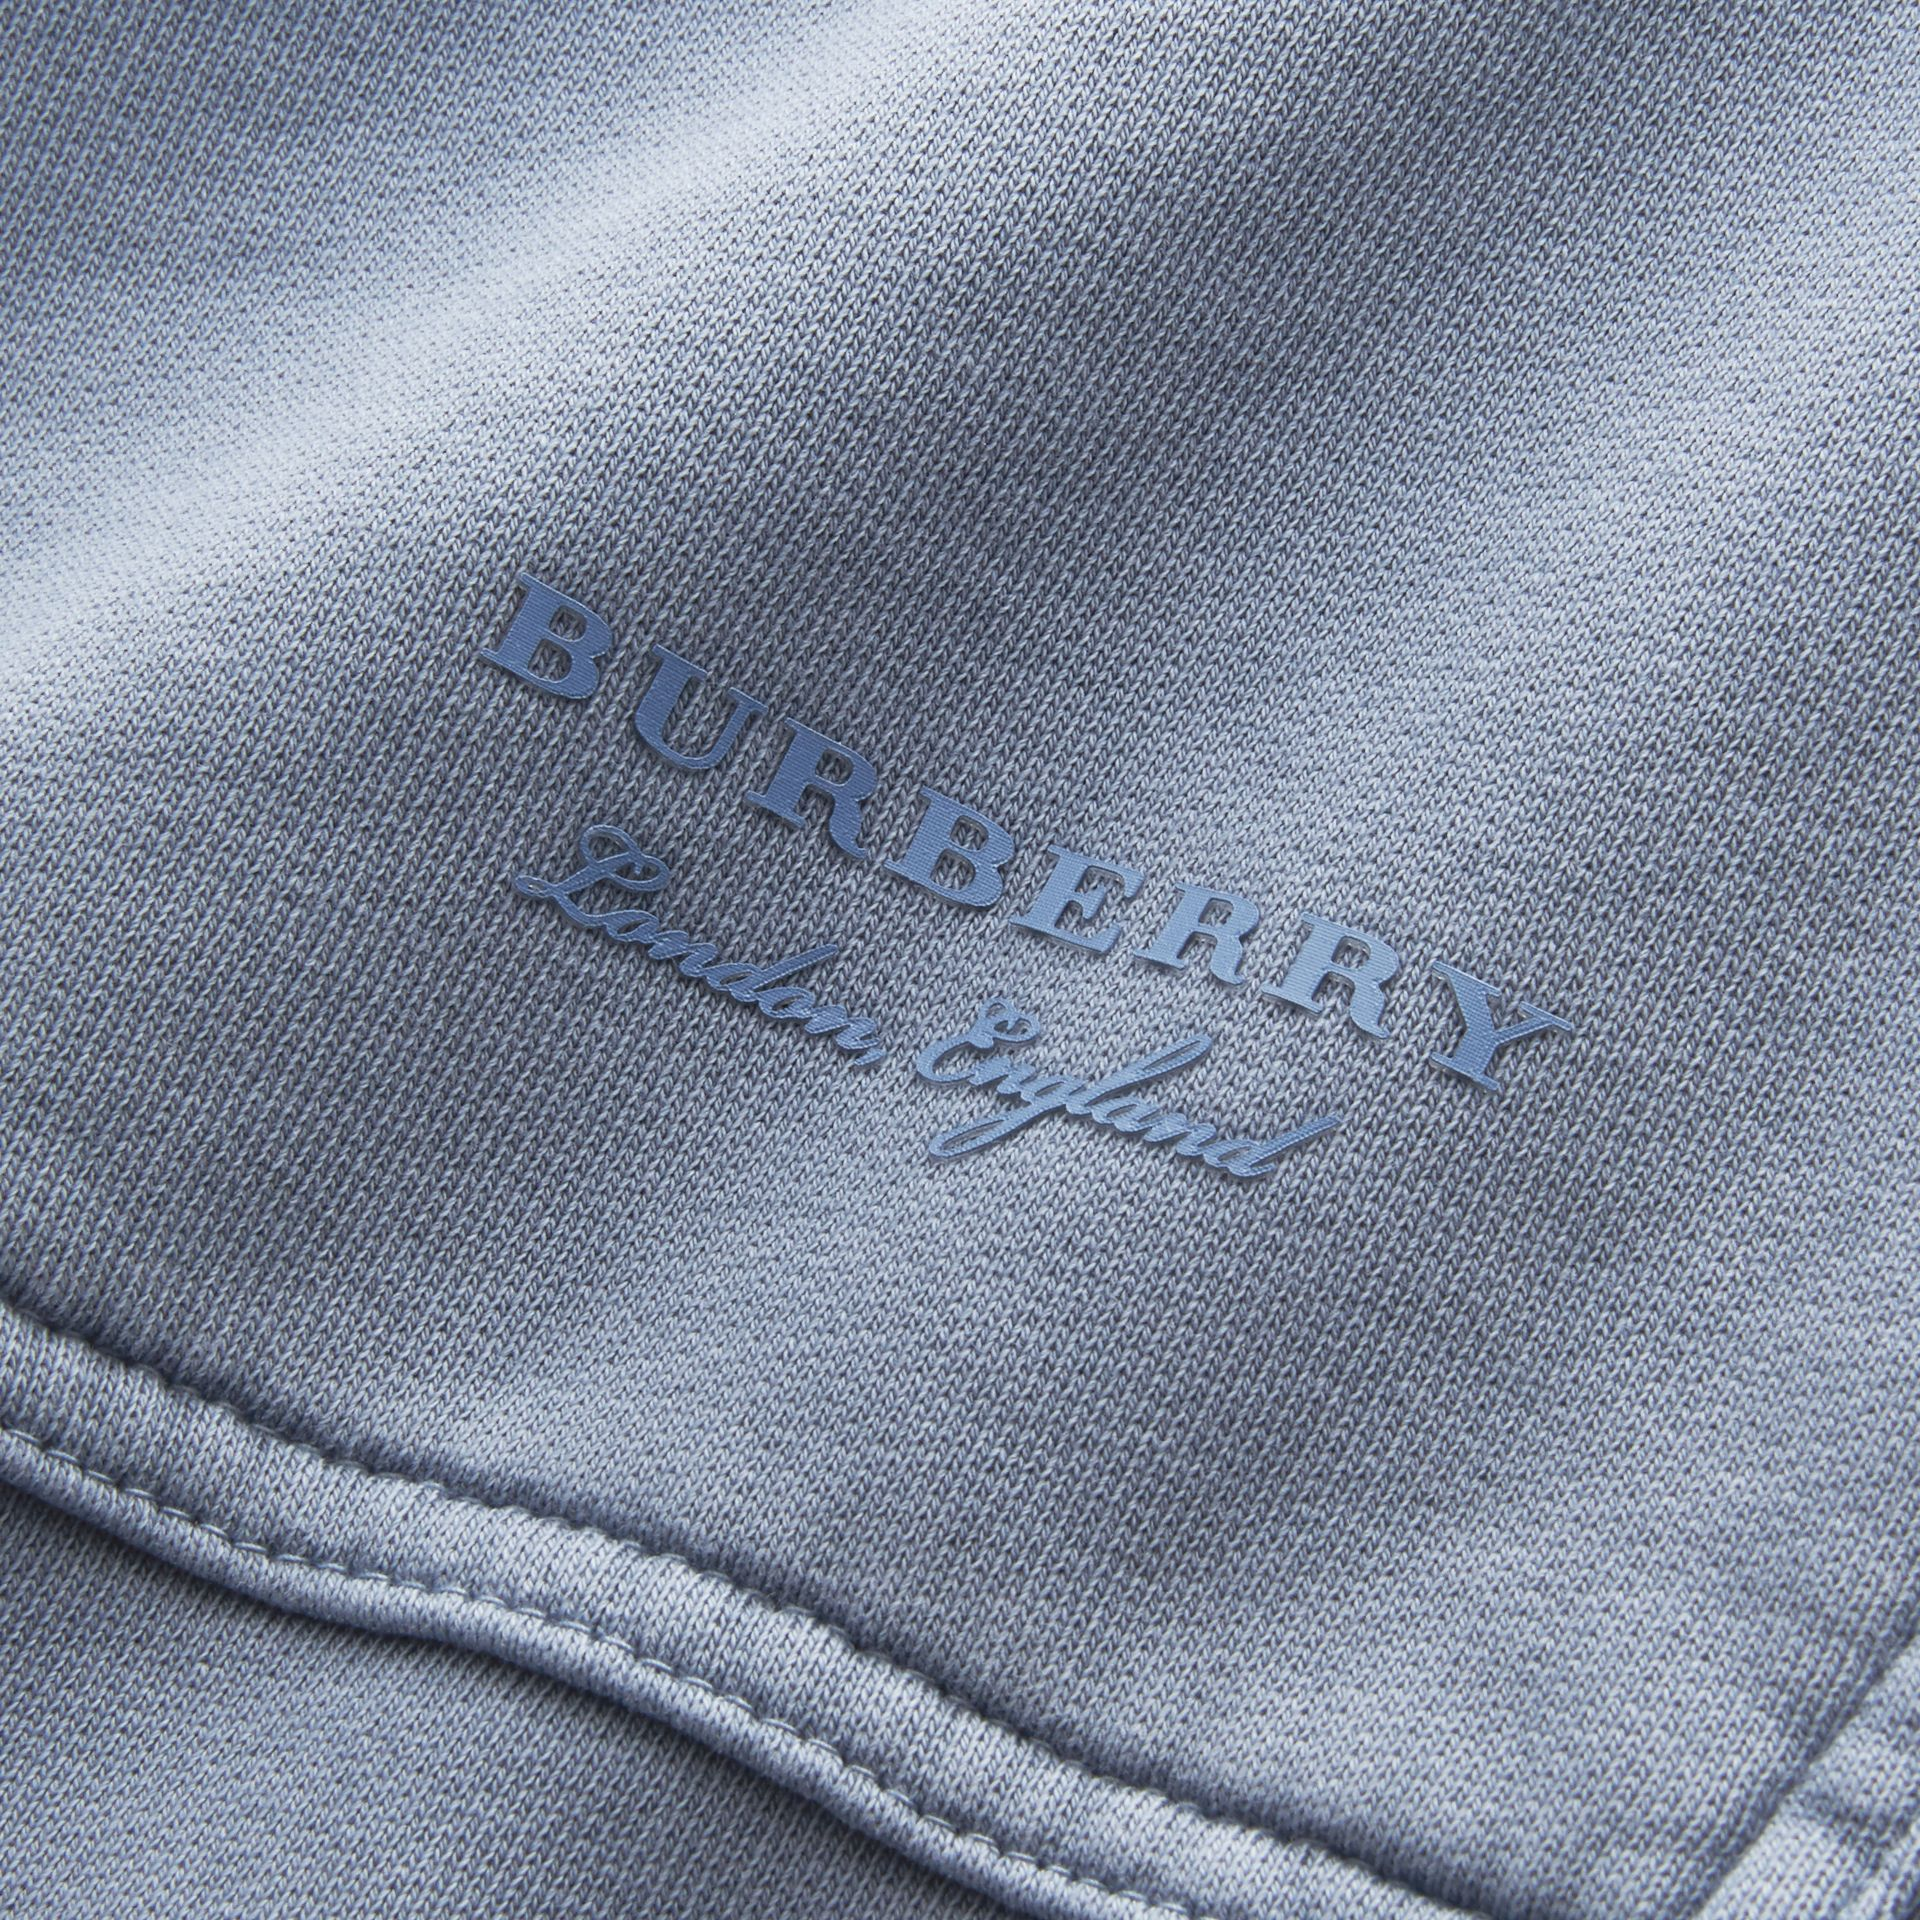 Unisex Pigment-dyed Cotton Oversize Sweatshirt in Dusty Blue - Women | Burberry Australia - gallery image 2